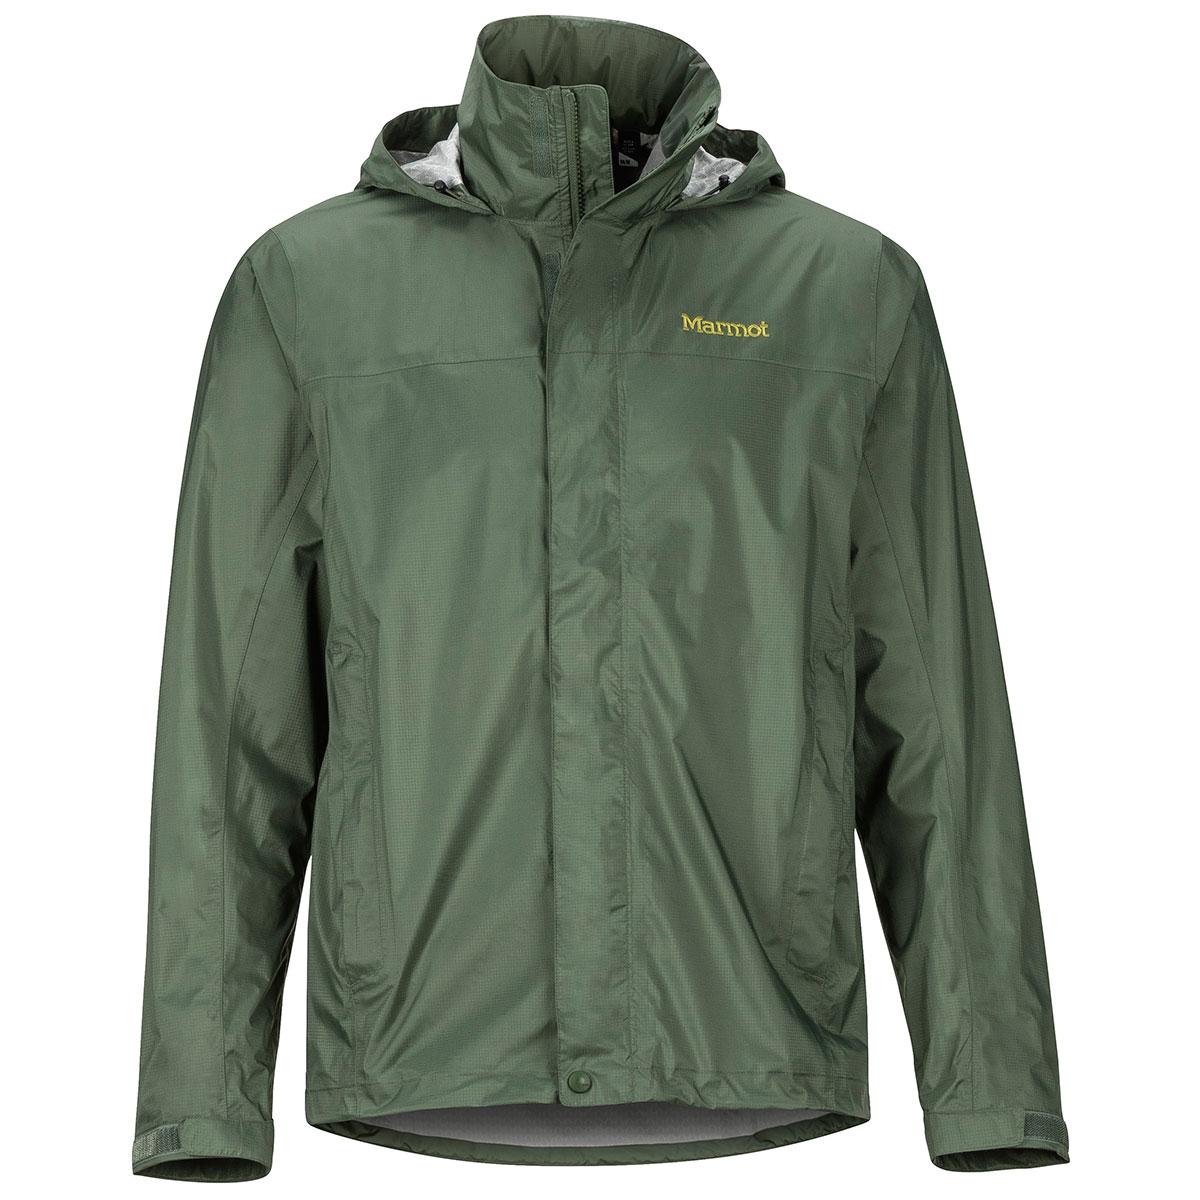 Marmot Men's Precip Eco Jacket - Black, XL